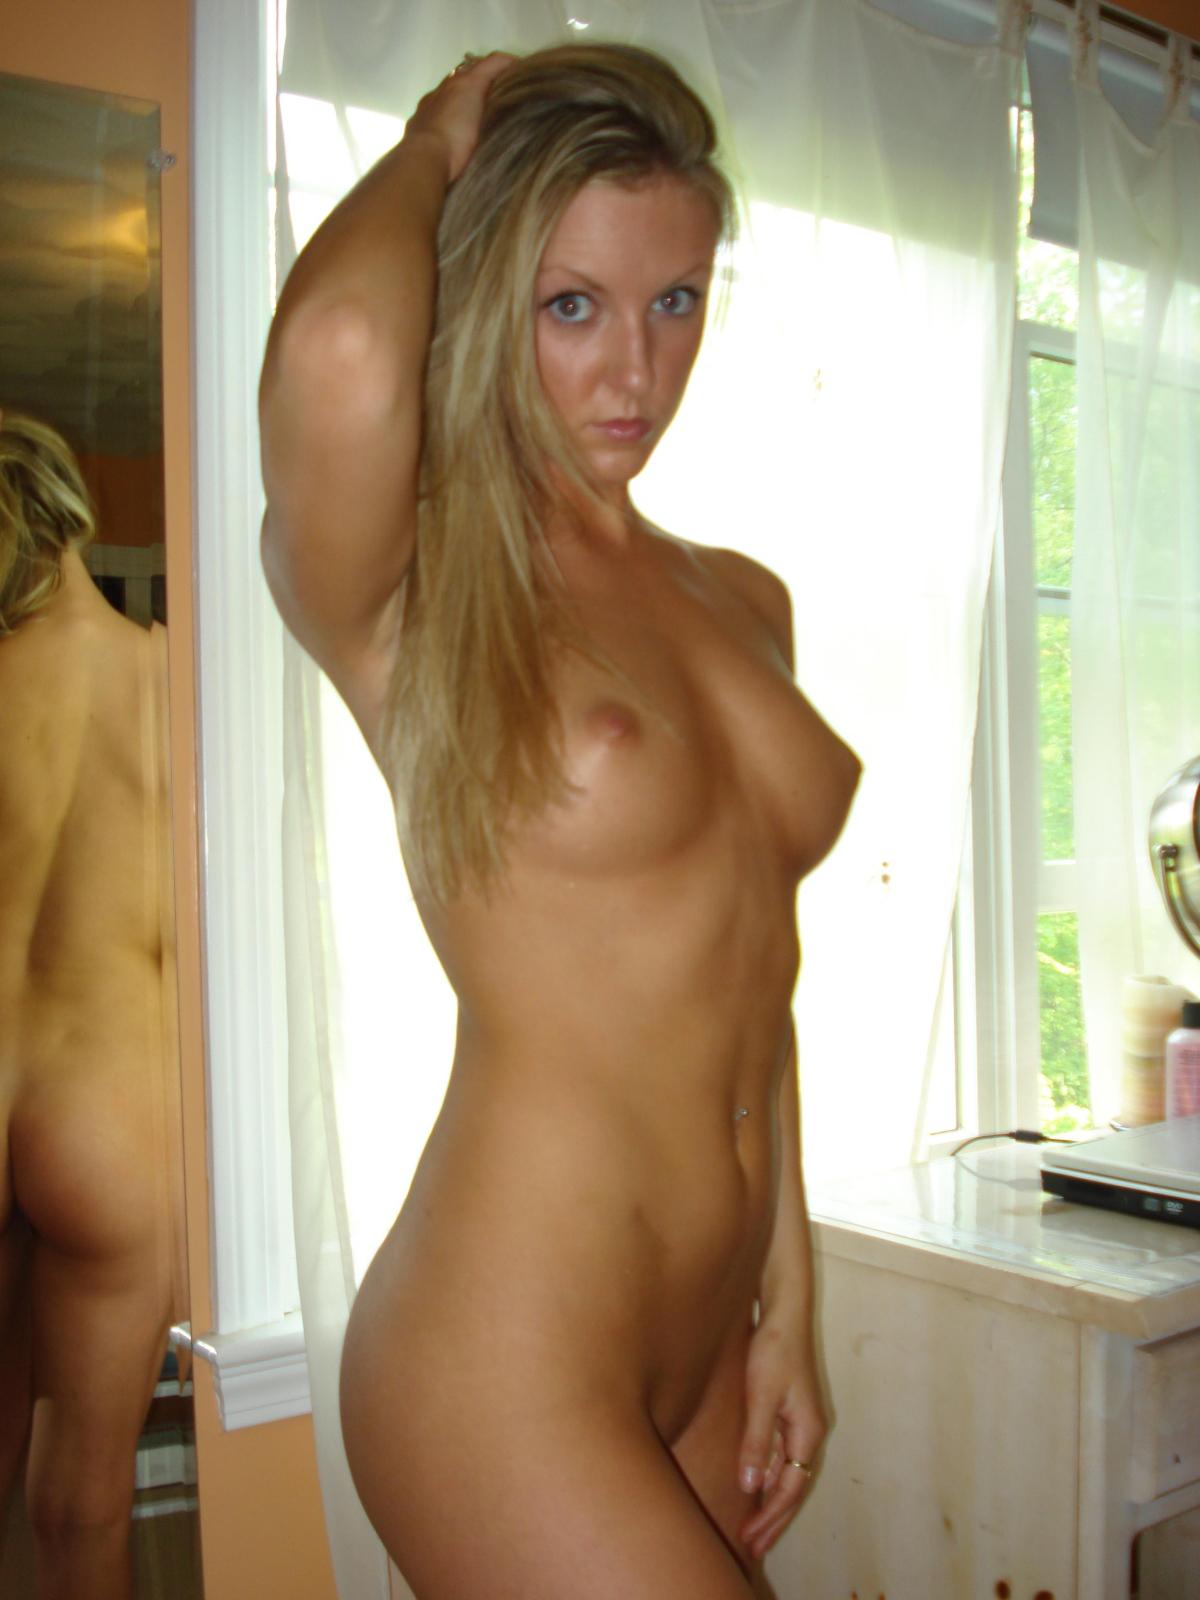 blonde-nude-ex-girlfriend-jeans-skirt-amateur-girl-21